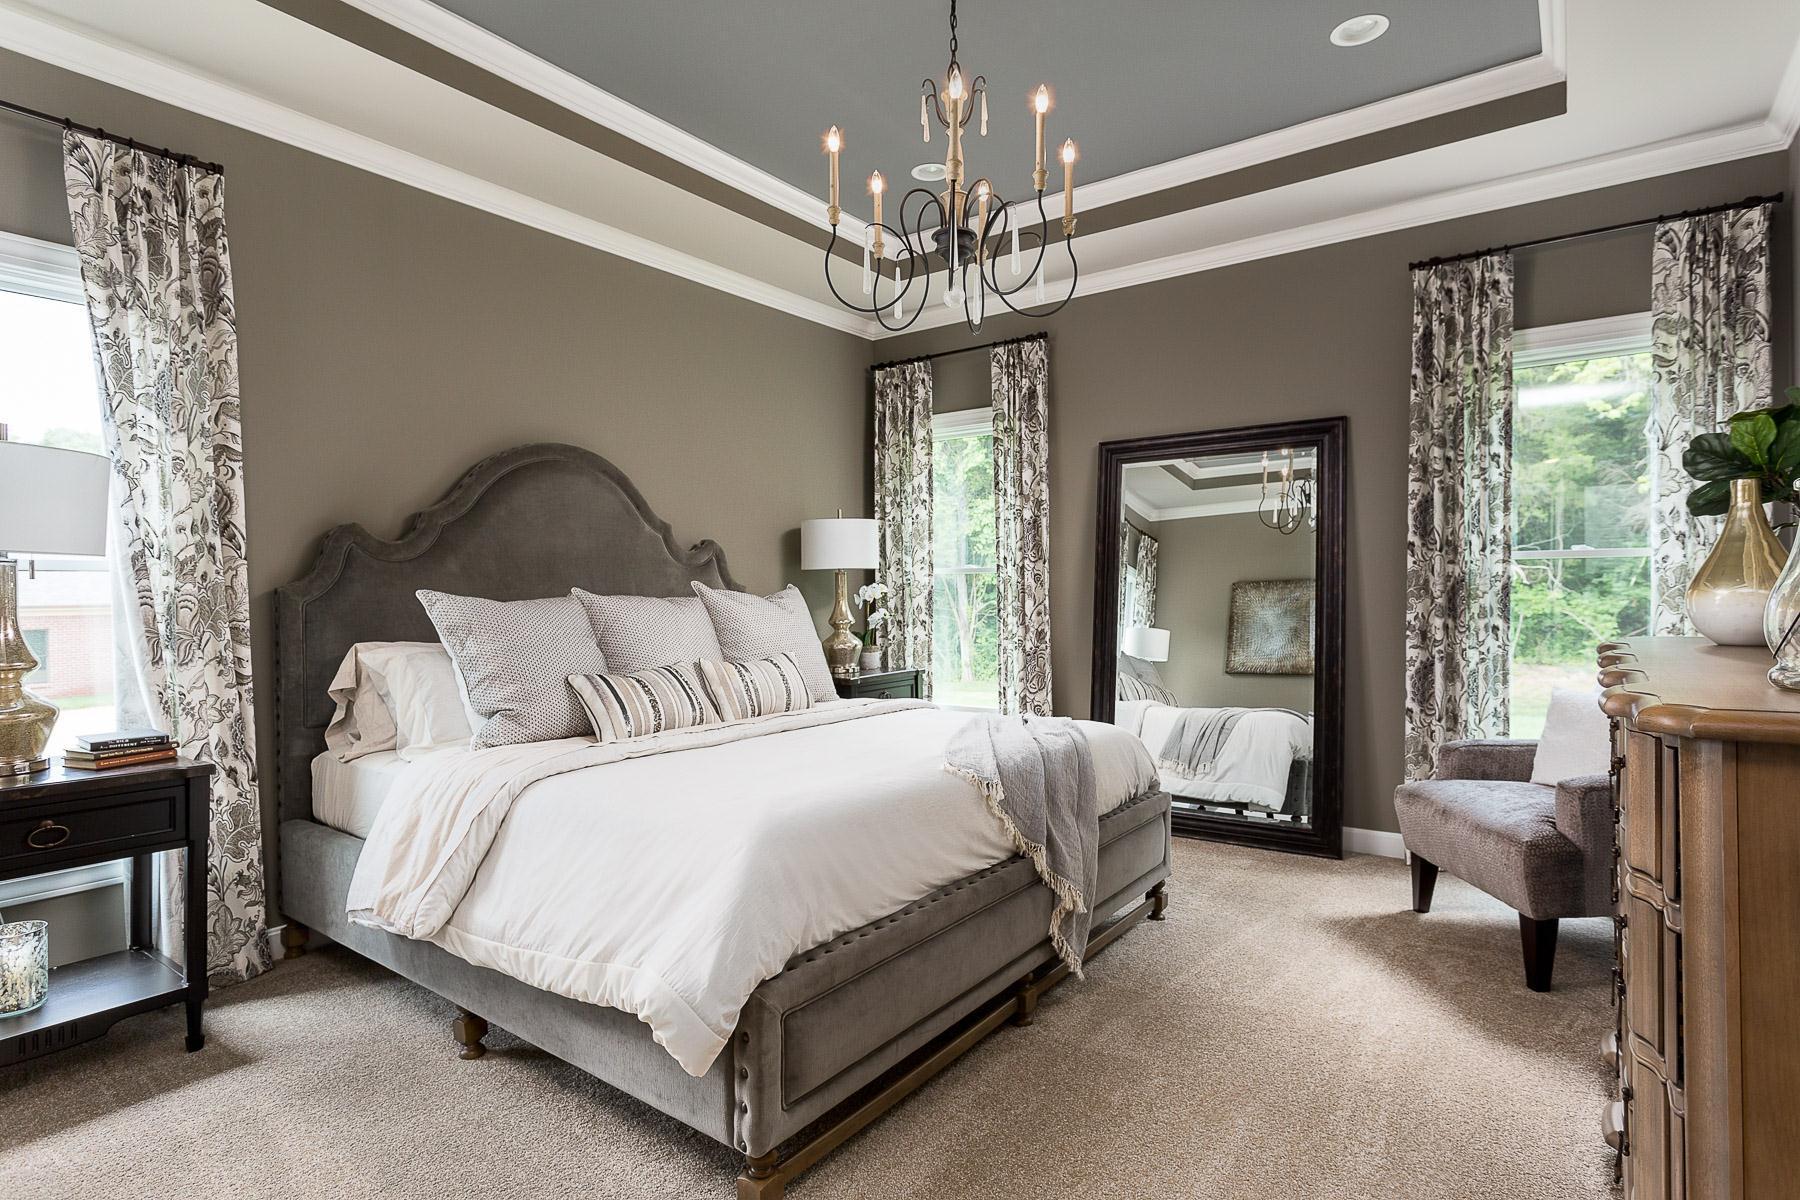 Bedroom featured in The Vardon By Elite Built Homes LLC in Louisville, KY